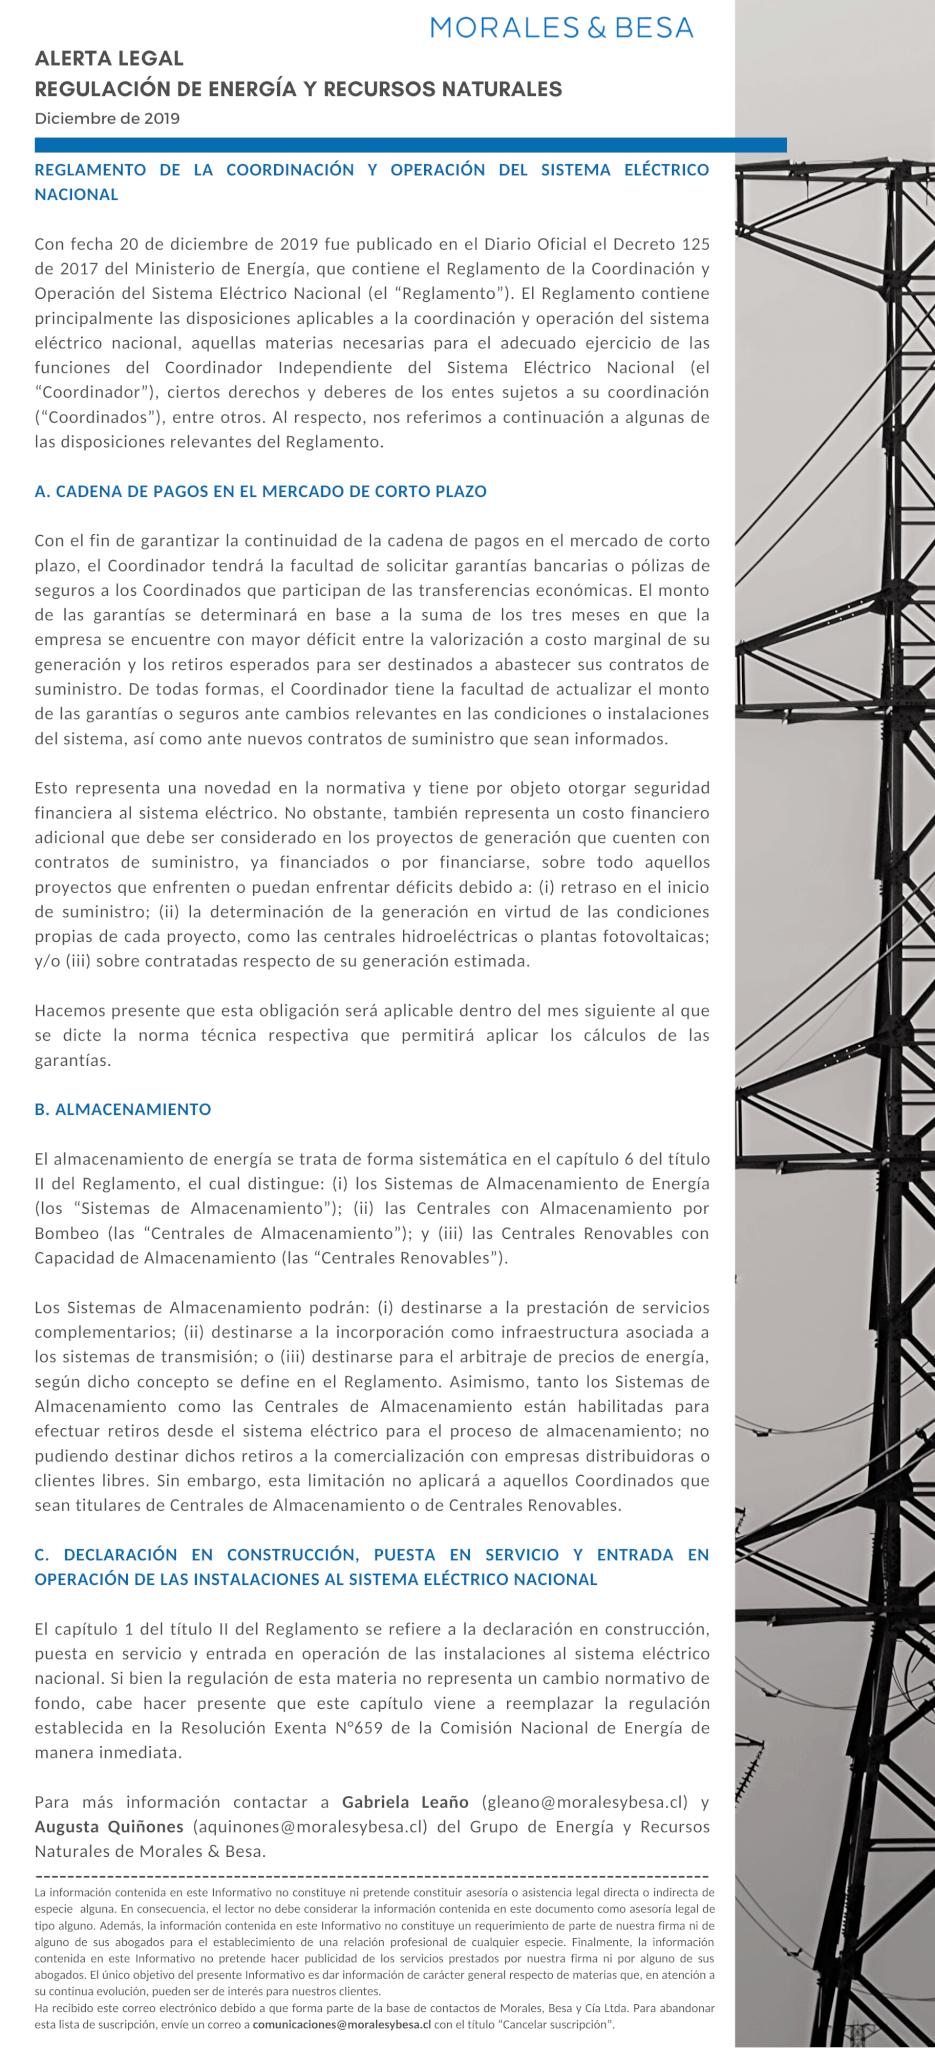 Alerta Legal M&B - Energía y Recursos Naturales - Diciembre 2019